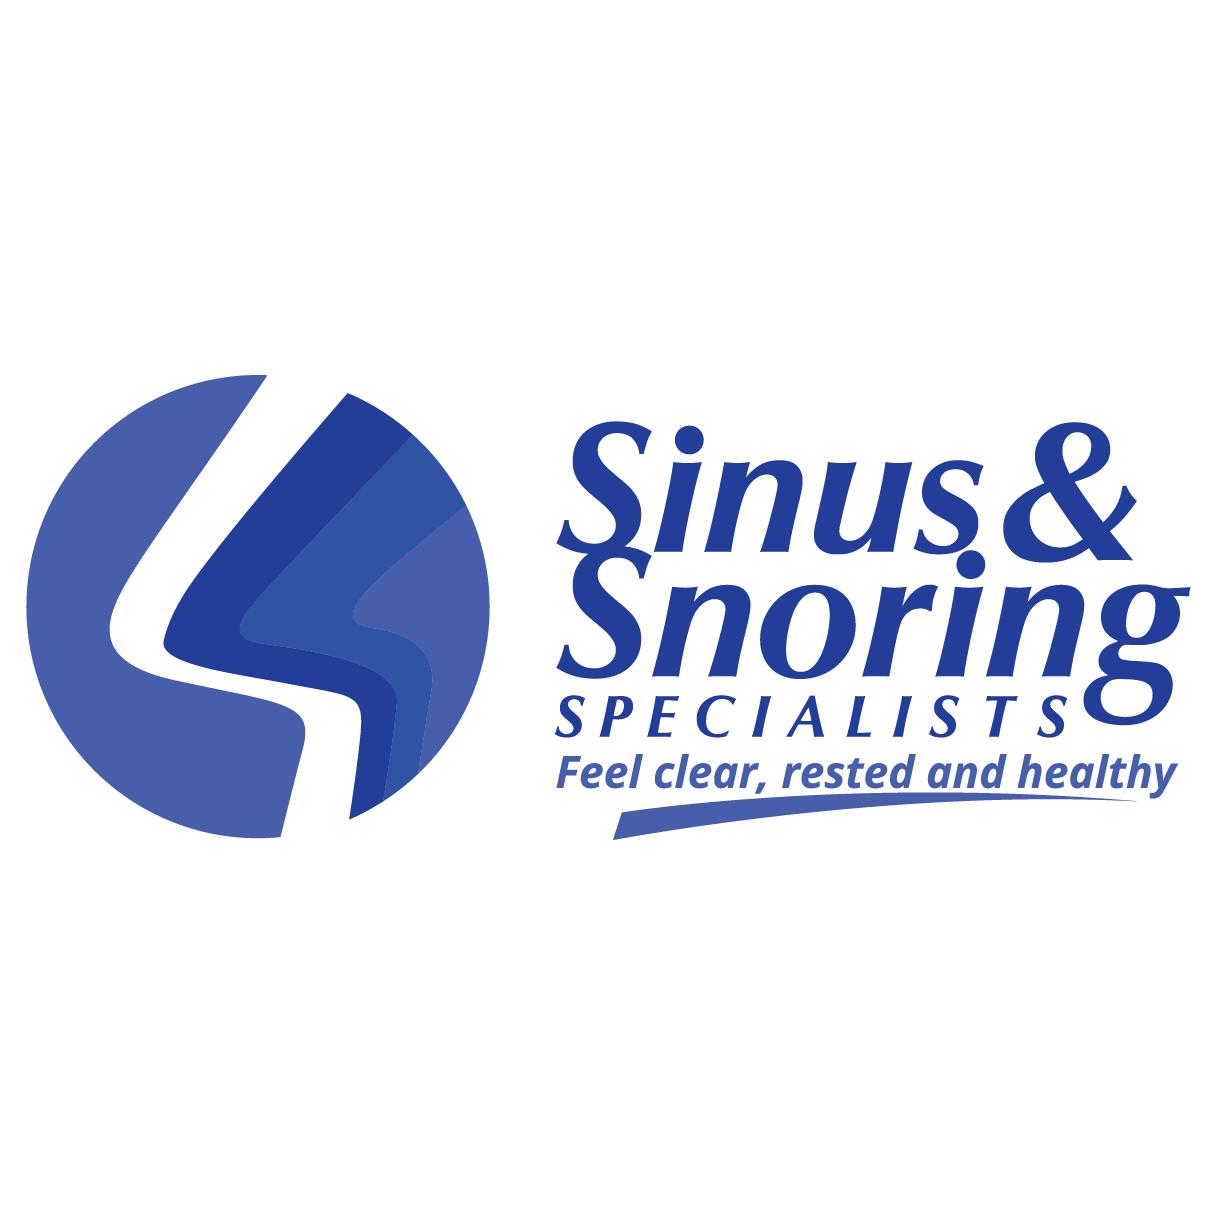 Sinus & Snoring Specialists